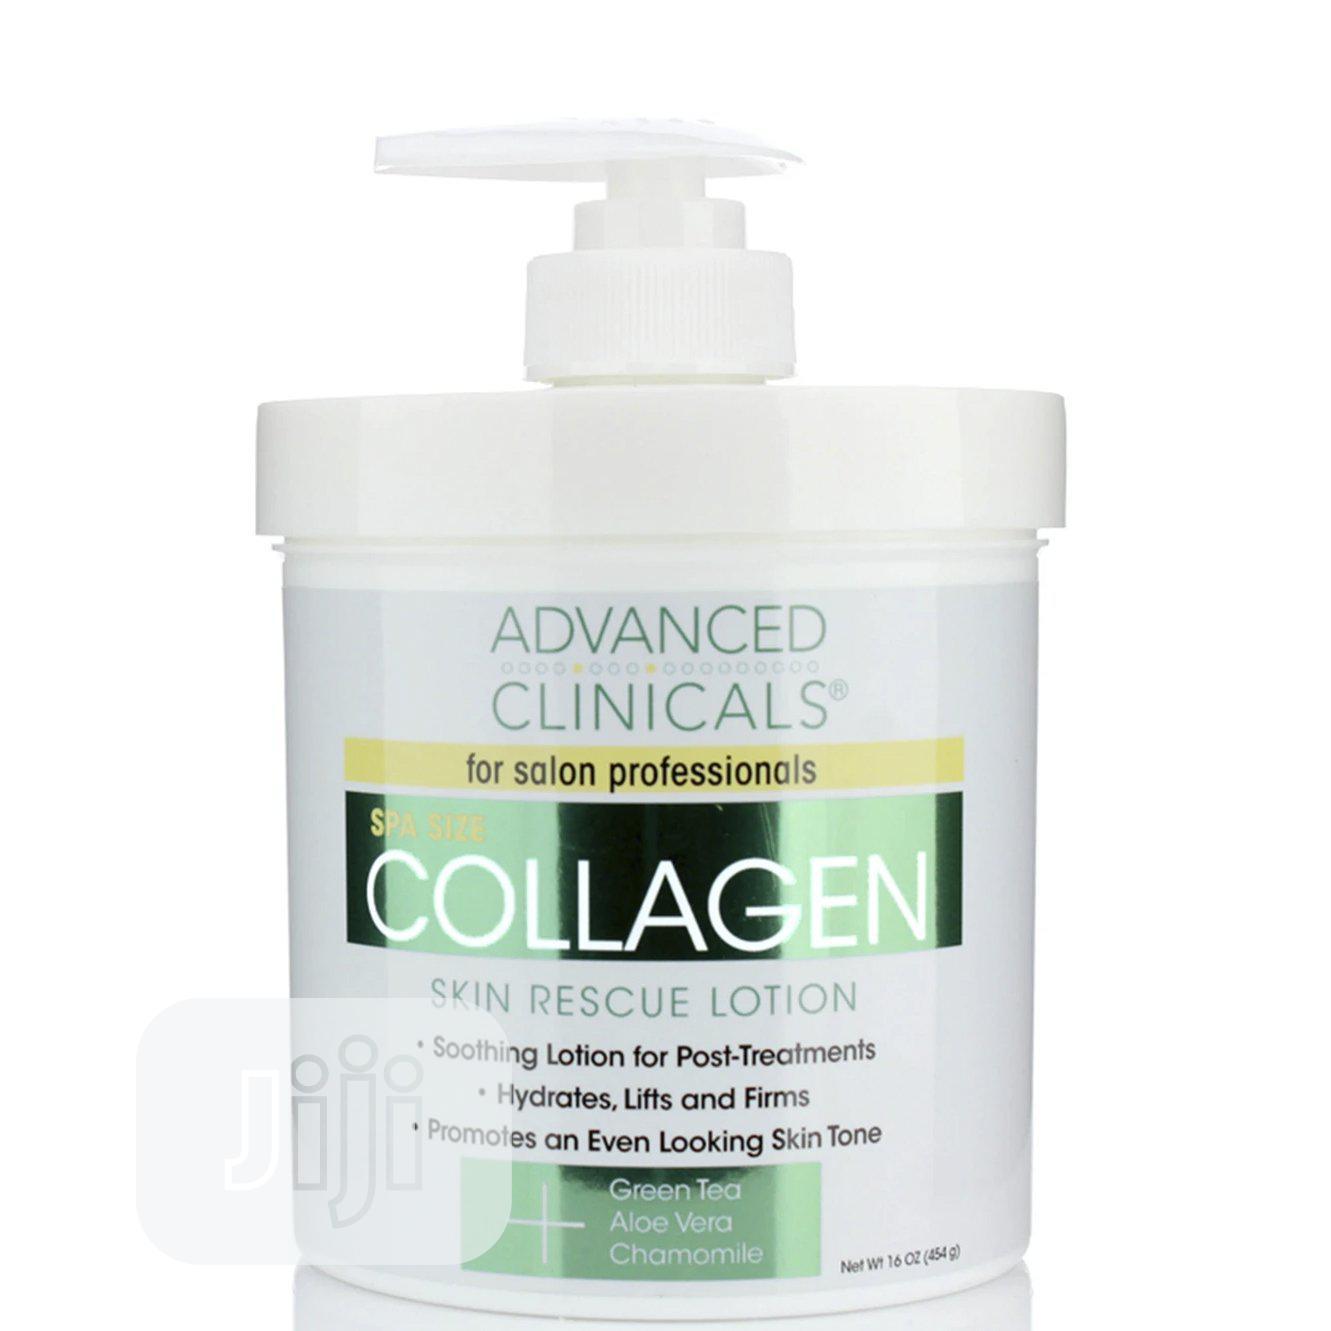 Advanced Clinicals Collagen Skin Rescue Lotion 16oz